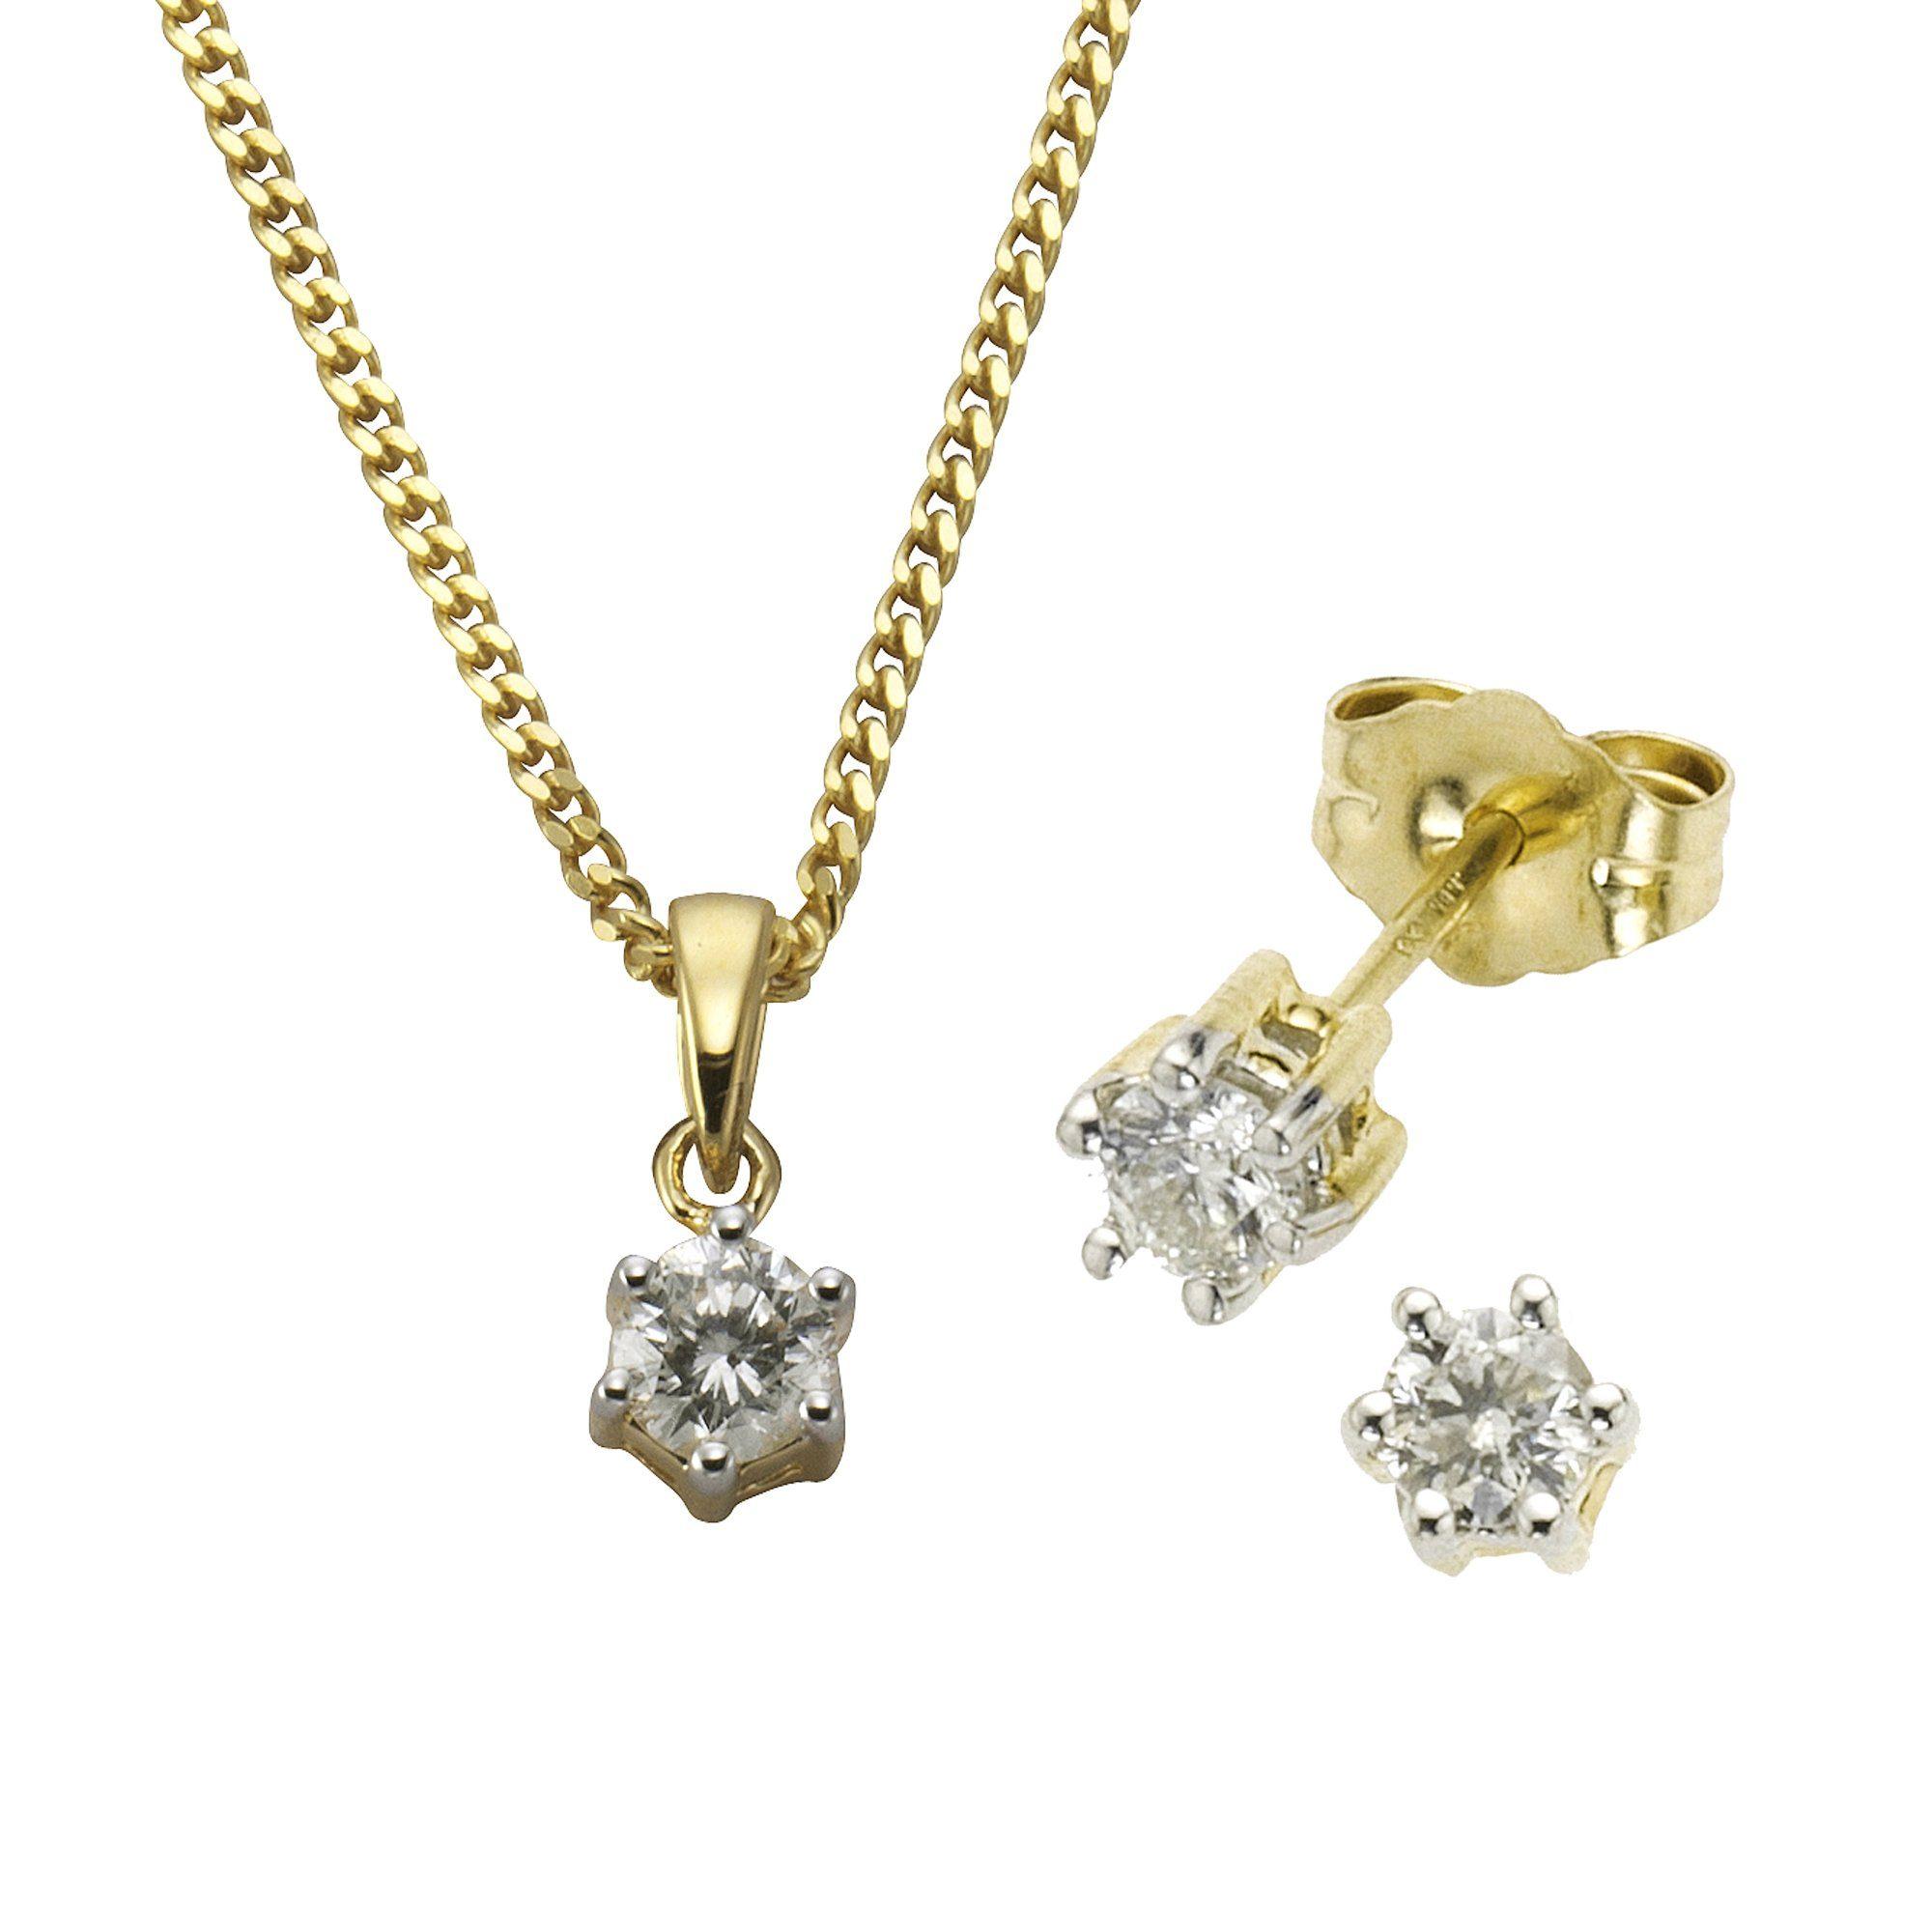 Diamonds by Ellen K Set Ohrstecker Anhänger mit Kette 585/- Gold Brillant 050ct | Schmuck > Ohrschmuck & Ohrringe > Ohrstecker | Gelb | Diamonds By Ellen K.